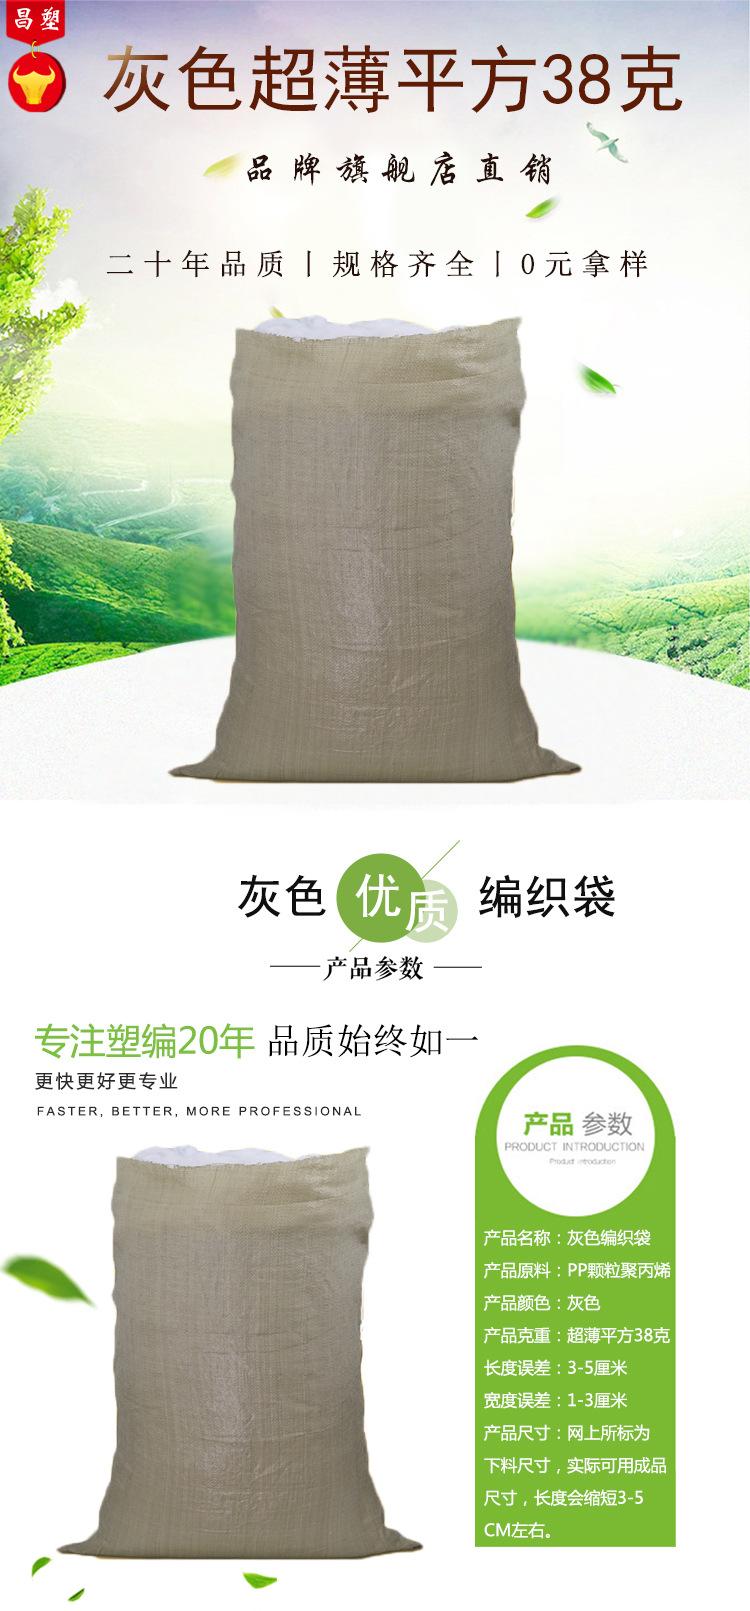 pp塑料灰色超薄☆��袋批�l支持印刷大�麻袋快�f物流打包袋蛇皮袋示例�D5